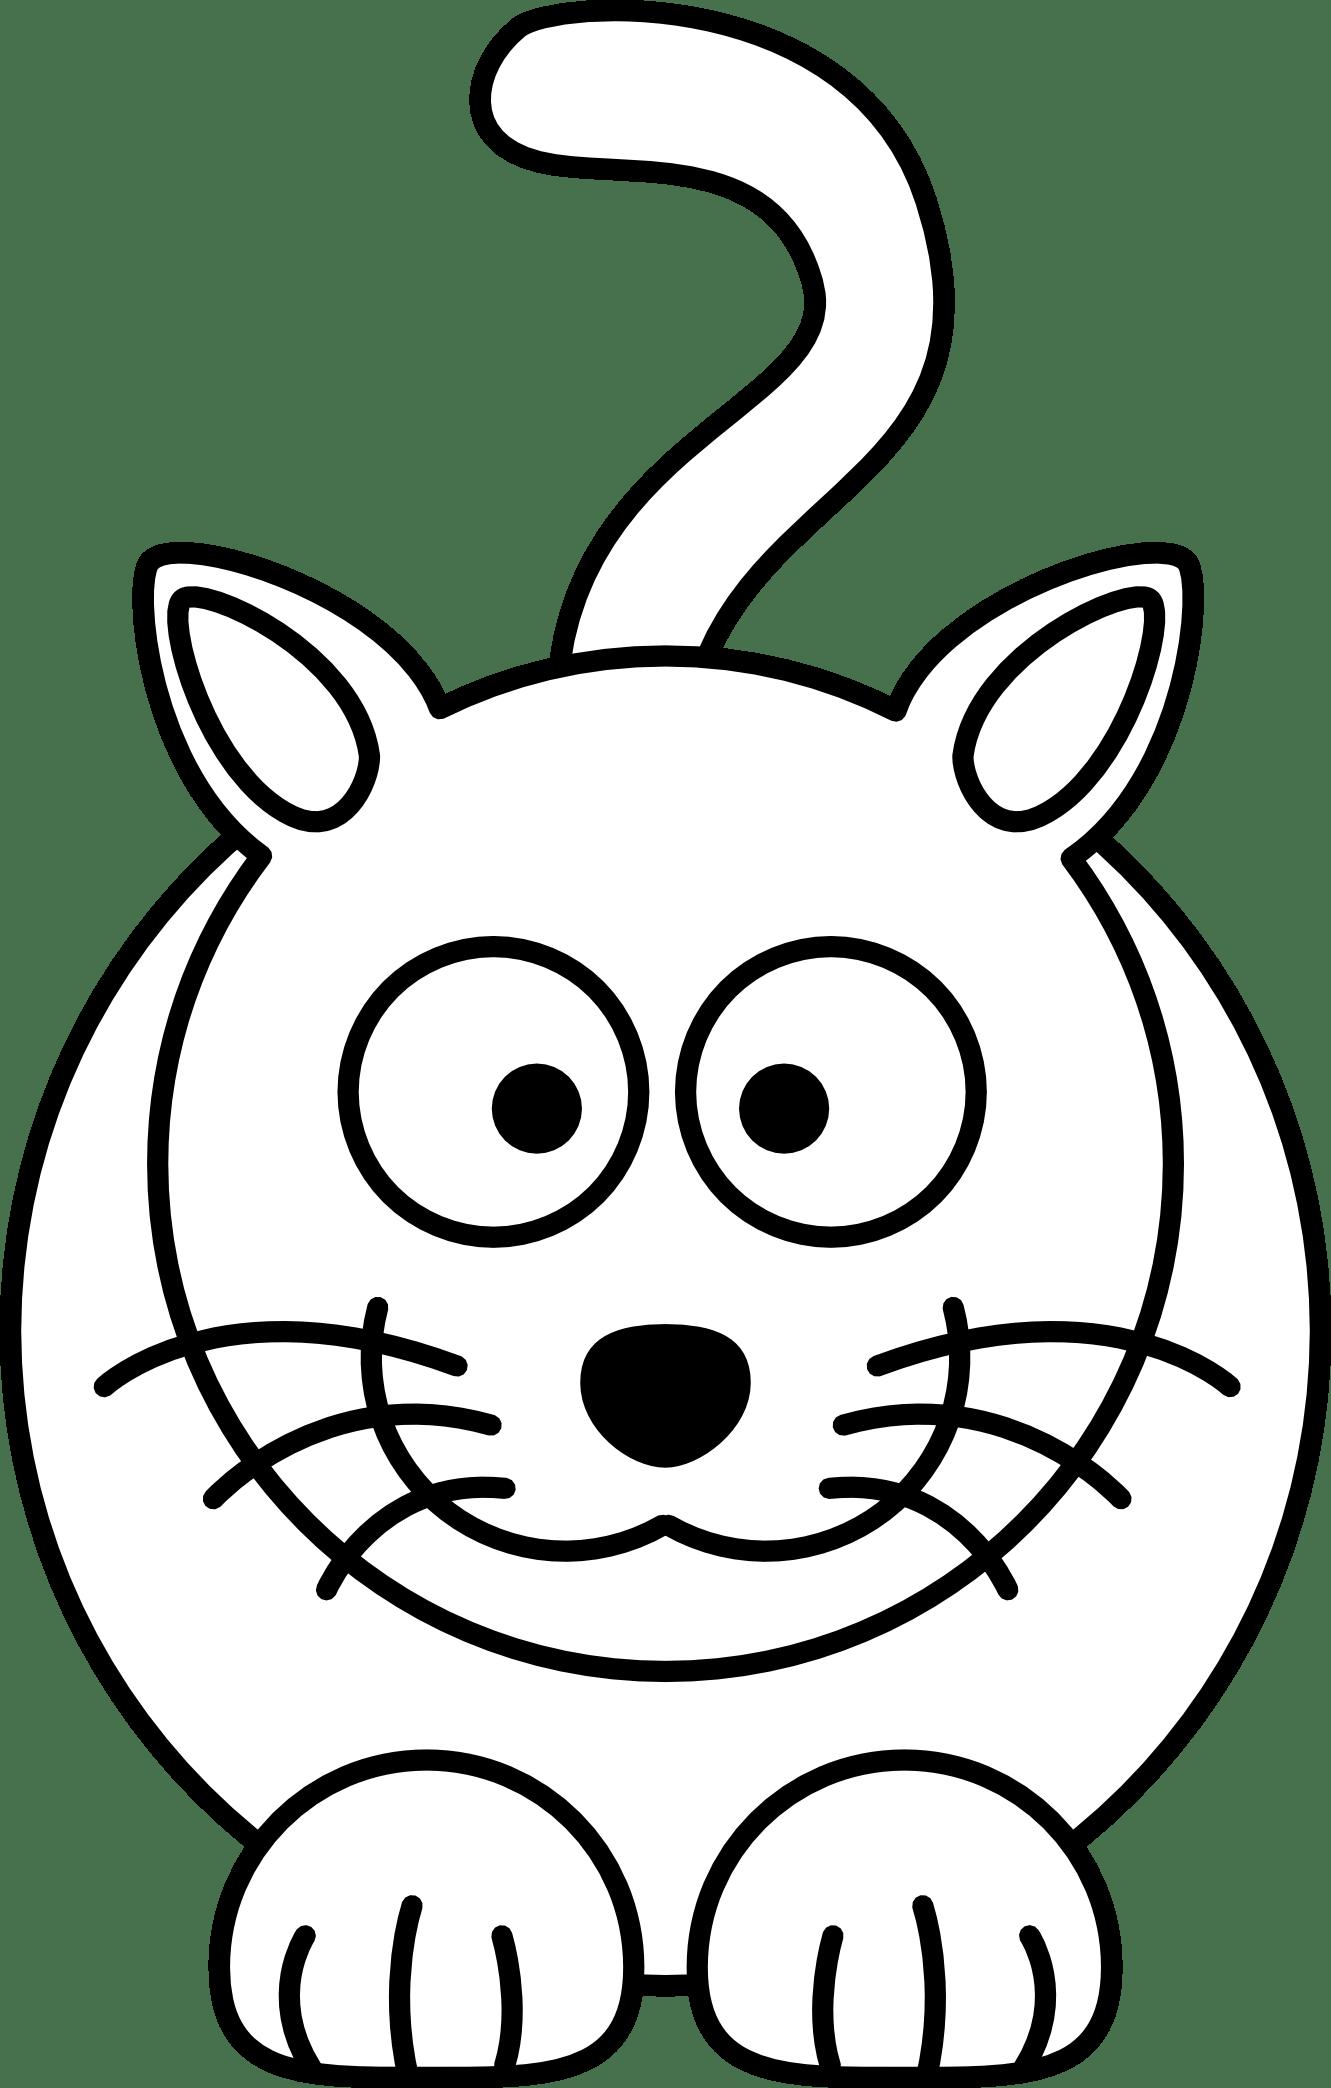 Lemmling Cartoon Cat Black White Line Art Coloring Book